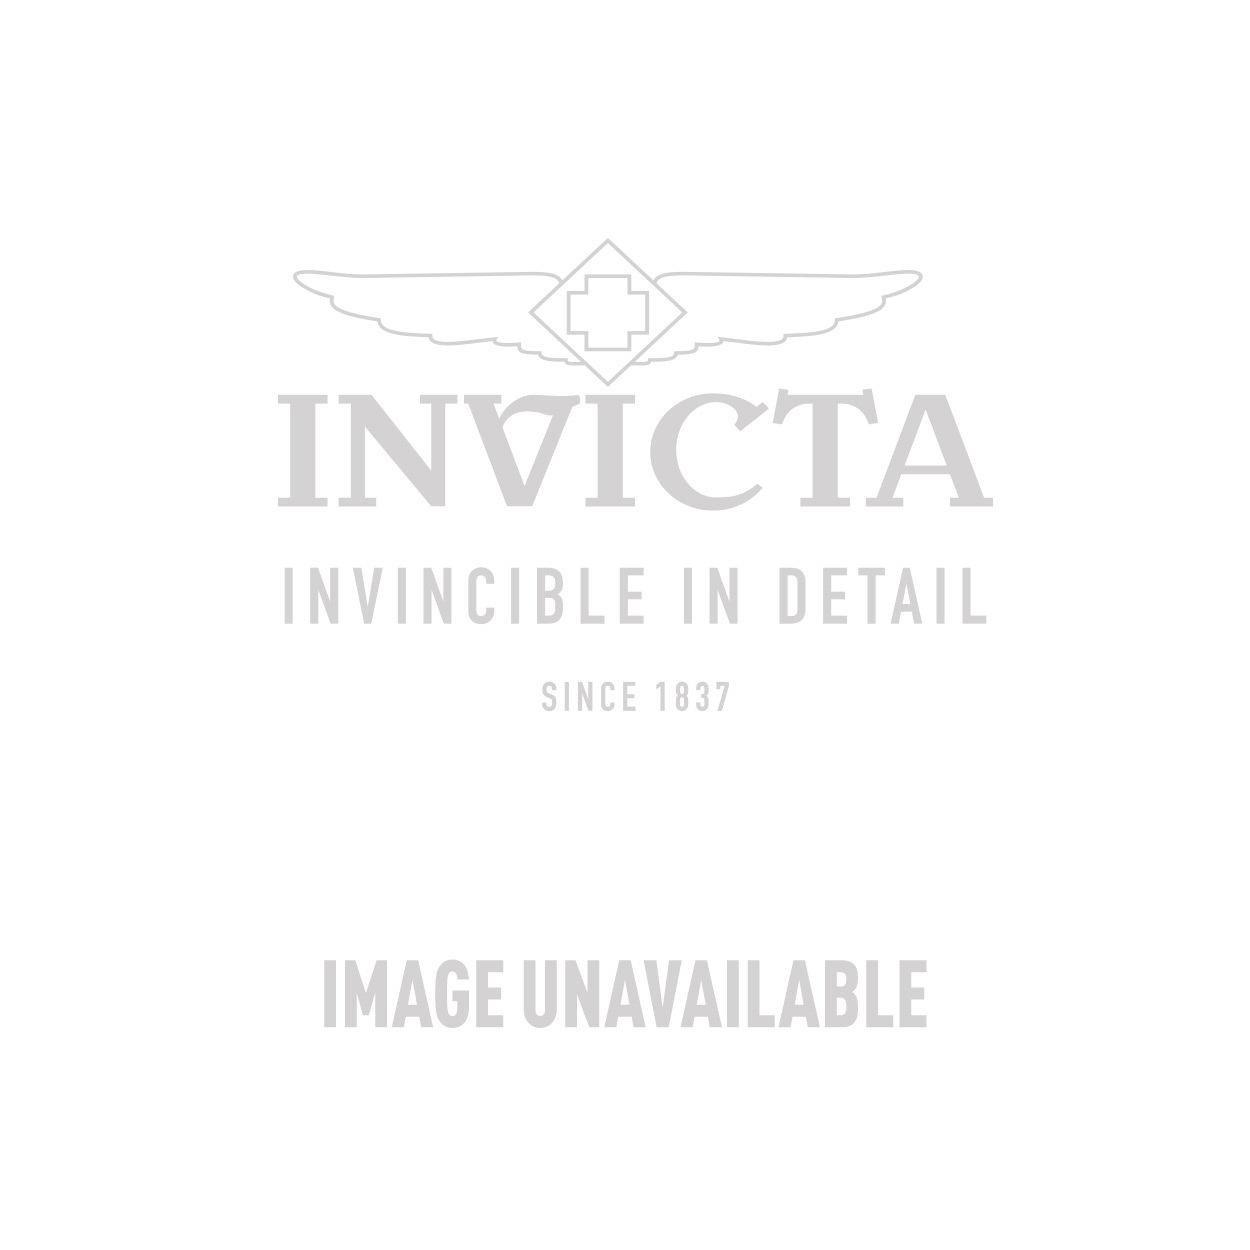 faca001e2 ... Invicta Speedway SCUBA Mens Quartz 50mm Stainless Steel Case Blue Dial  - Model 25943. 25943. Invicta Model 25943 25943